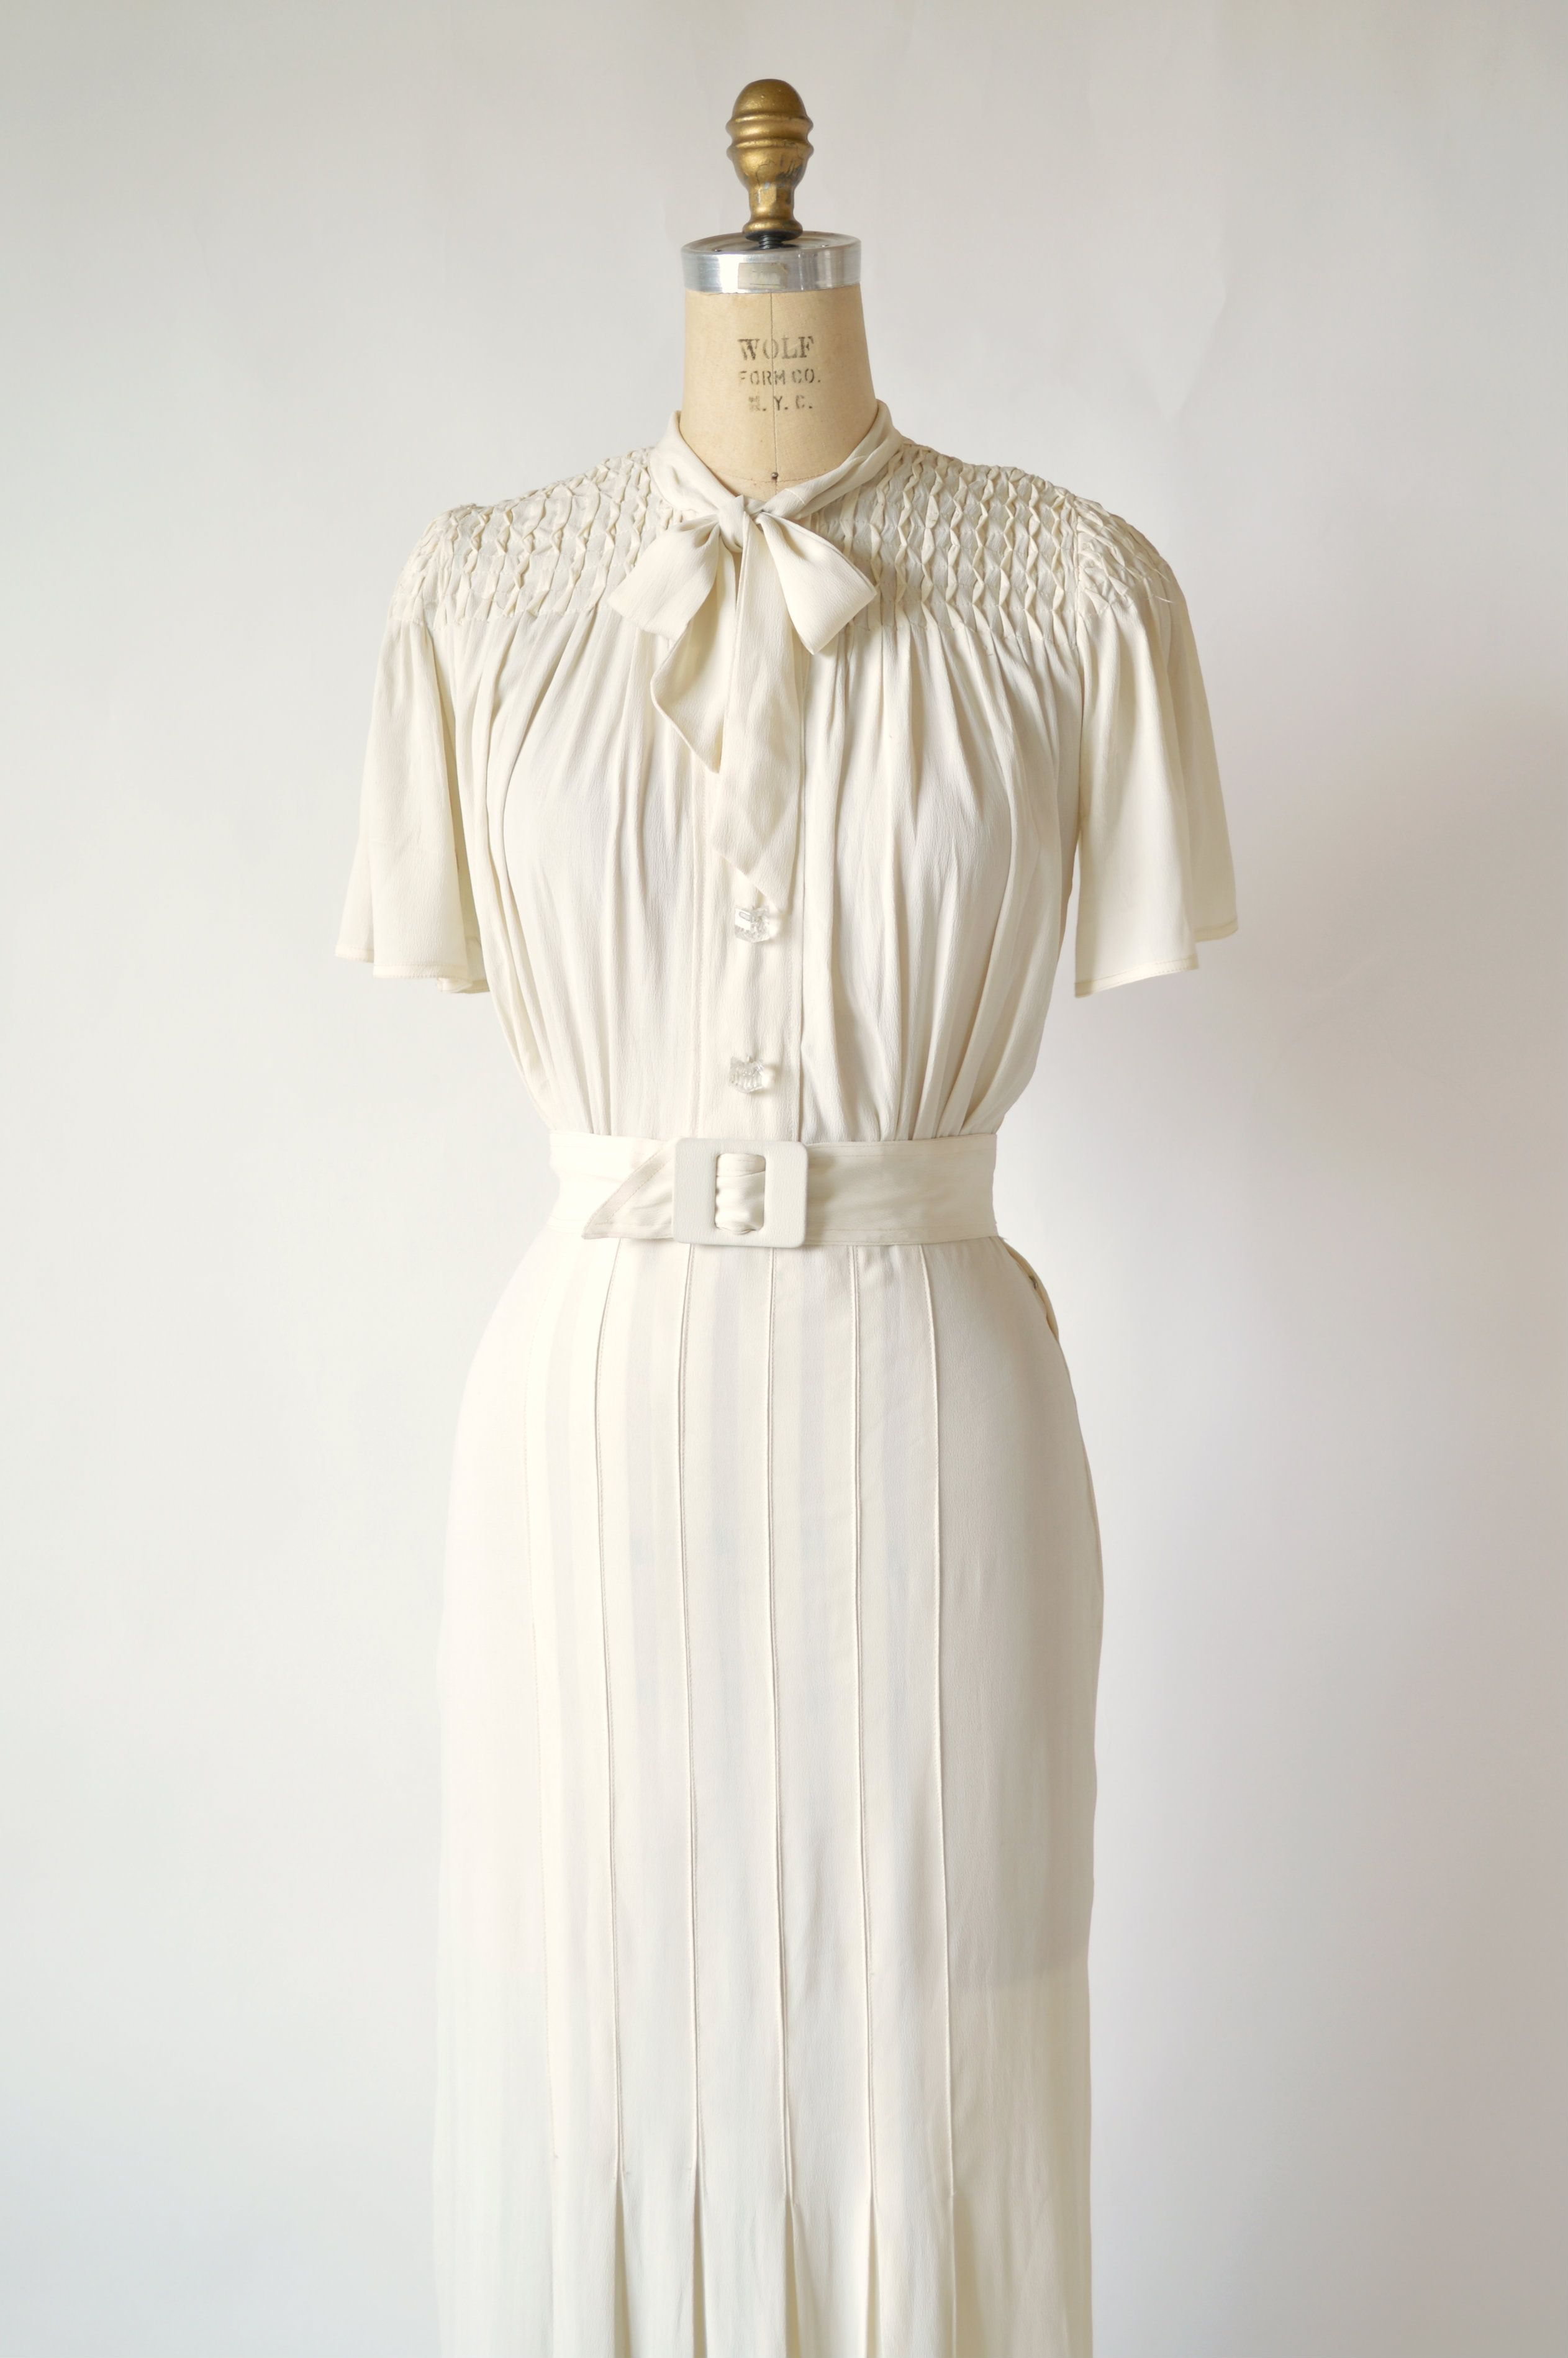 1920s Wedding Dress Vintage Outfits Vintage Clothes Shop Vintage Clothing Stores